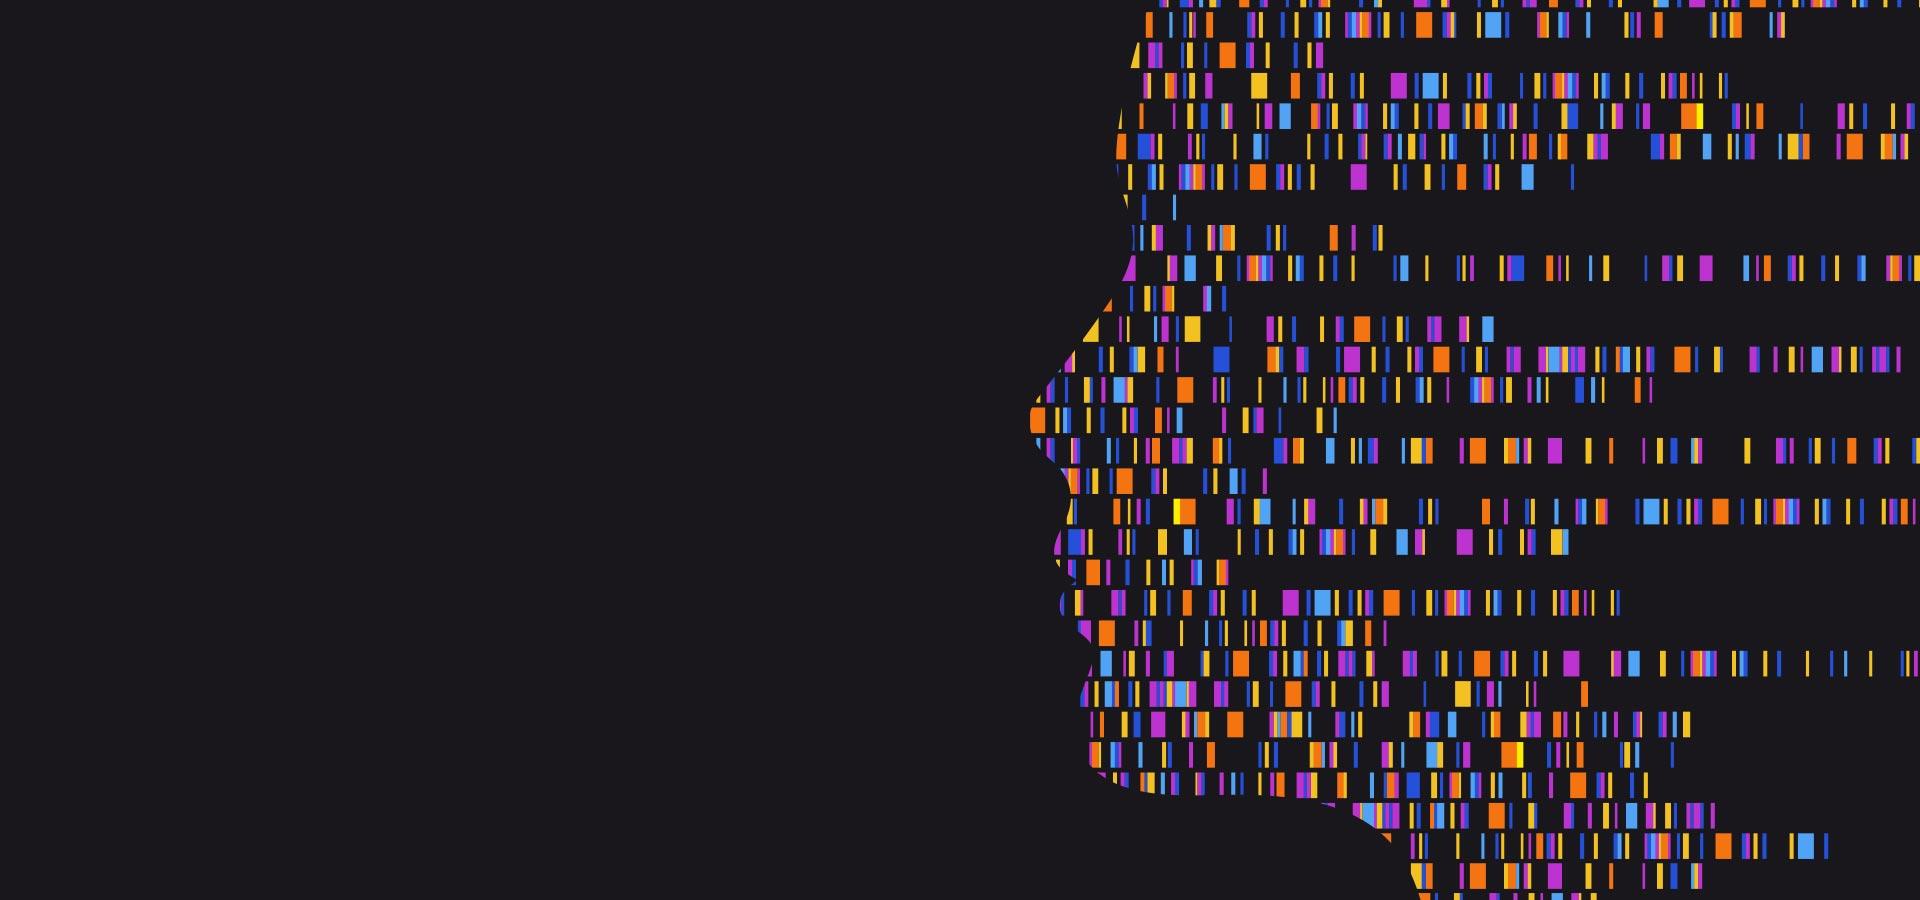 genomica essecore